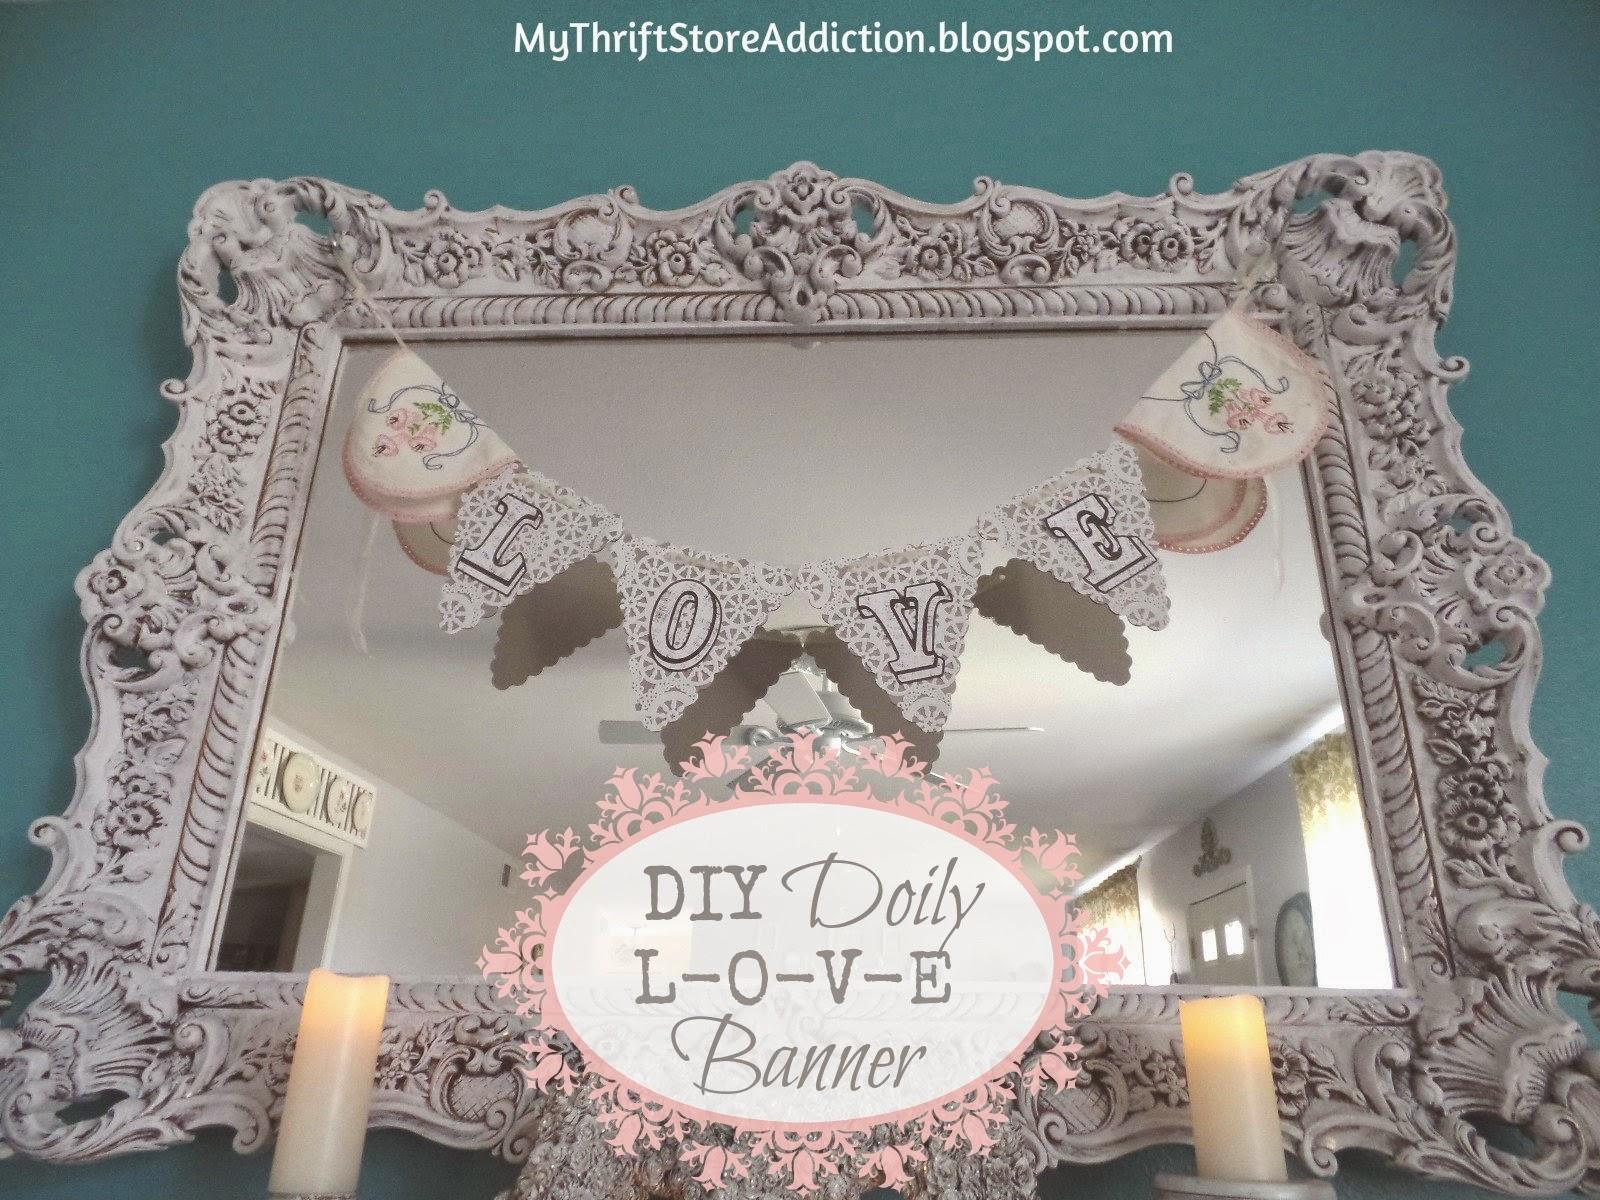 DIY doily l-o-v-e banner